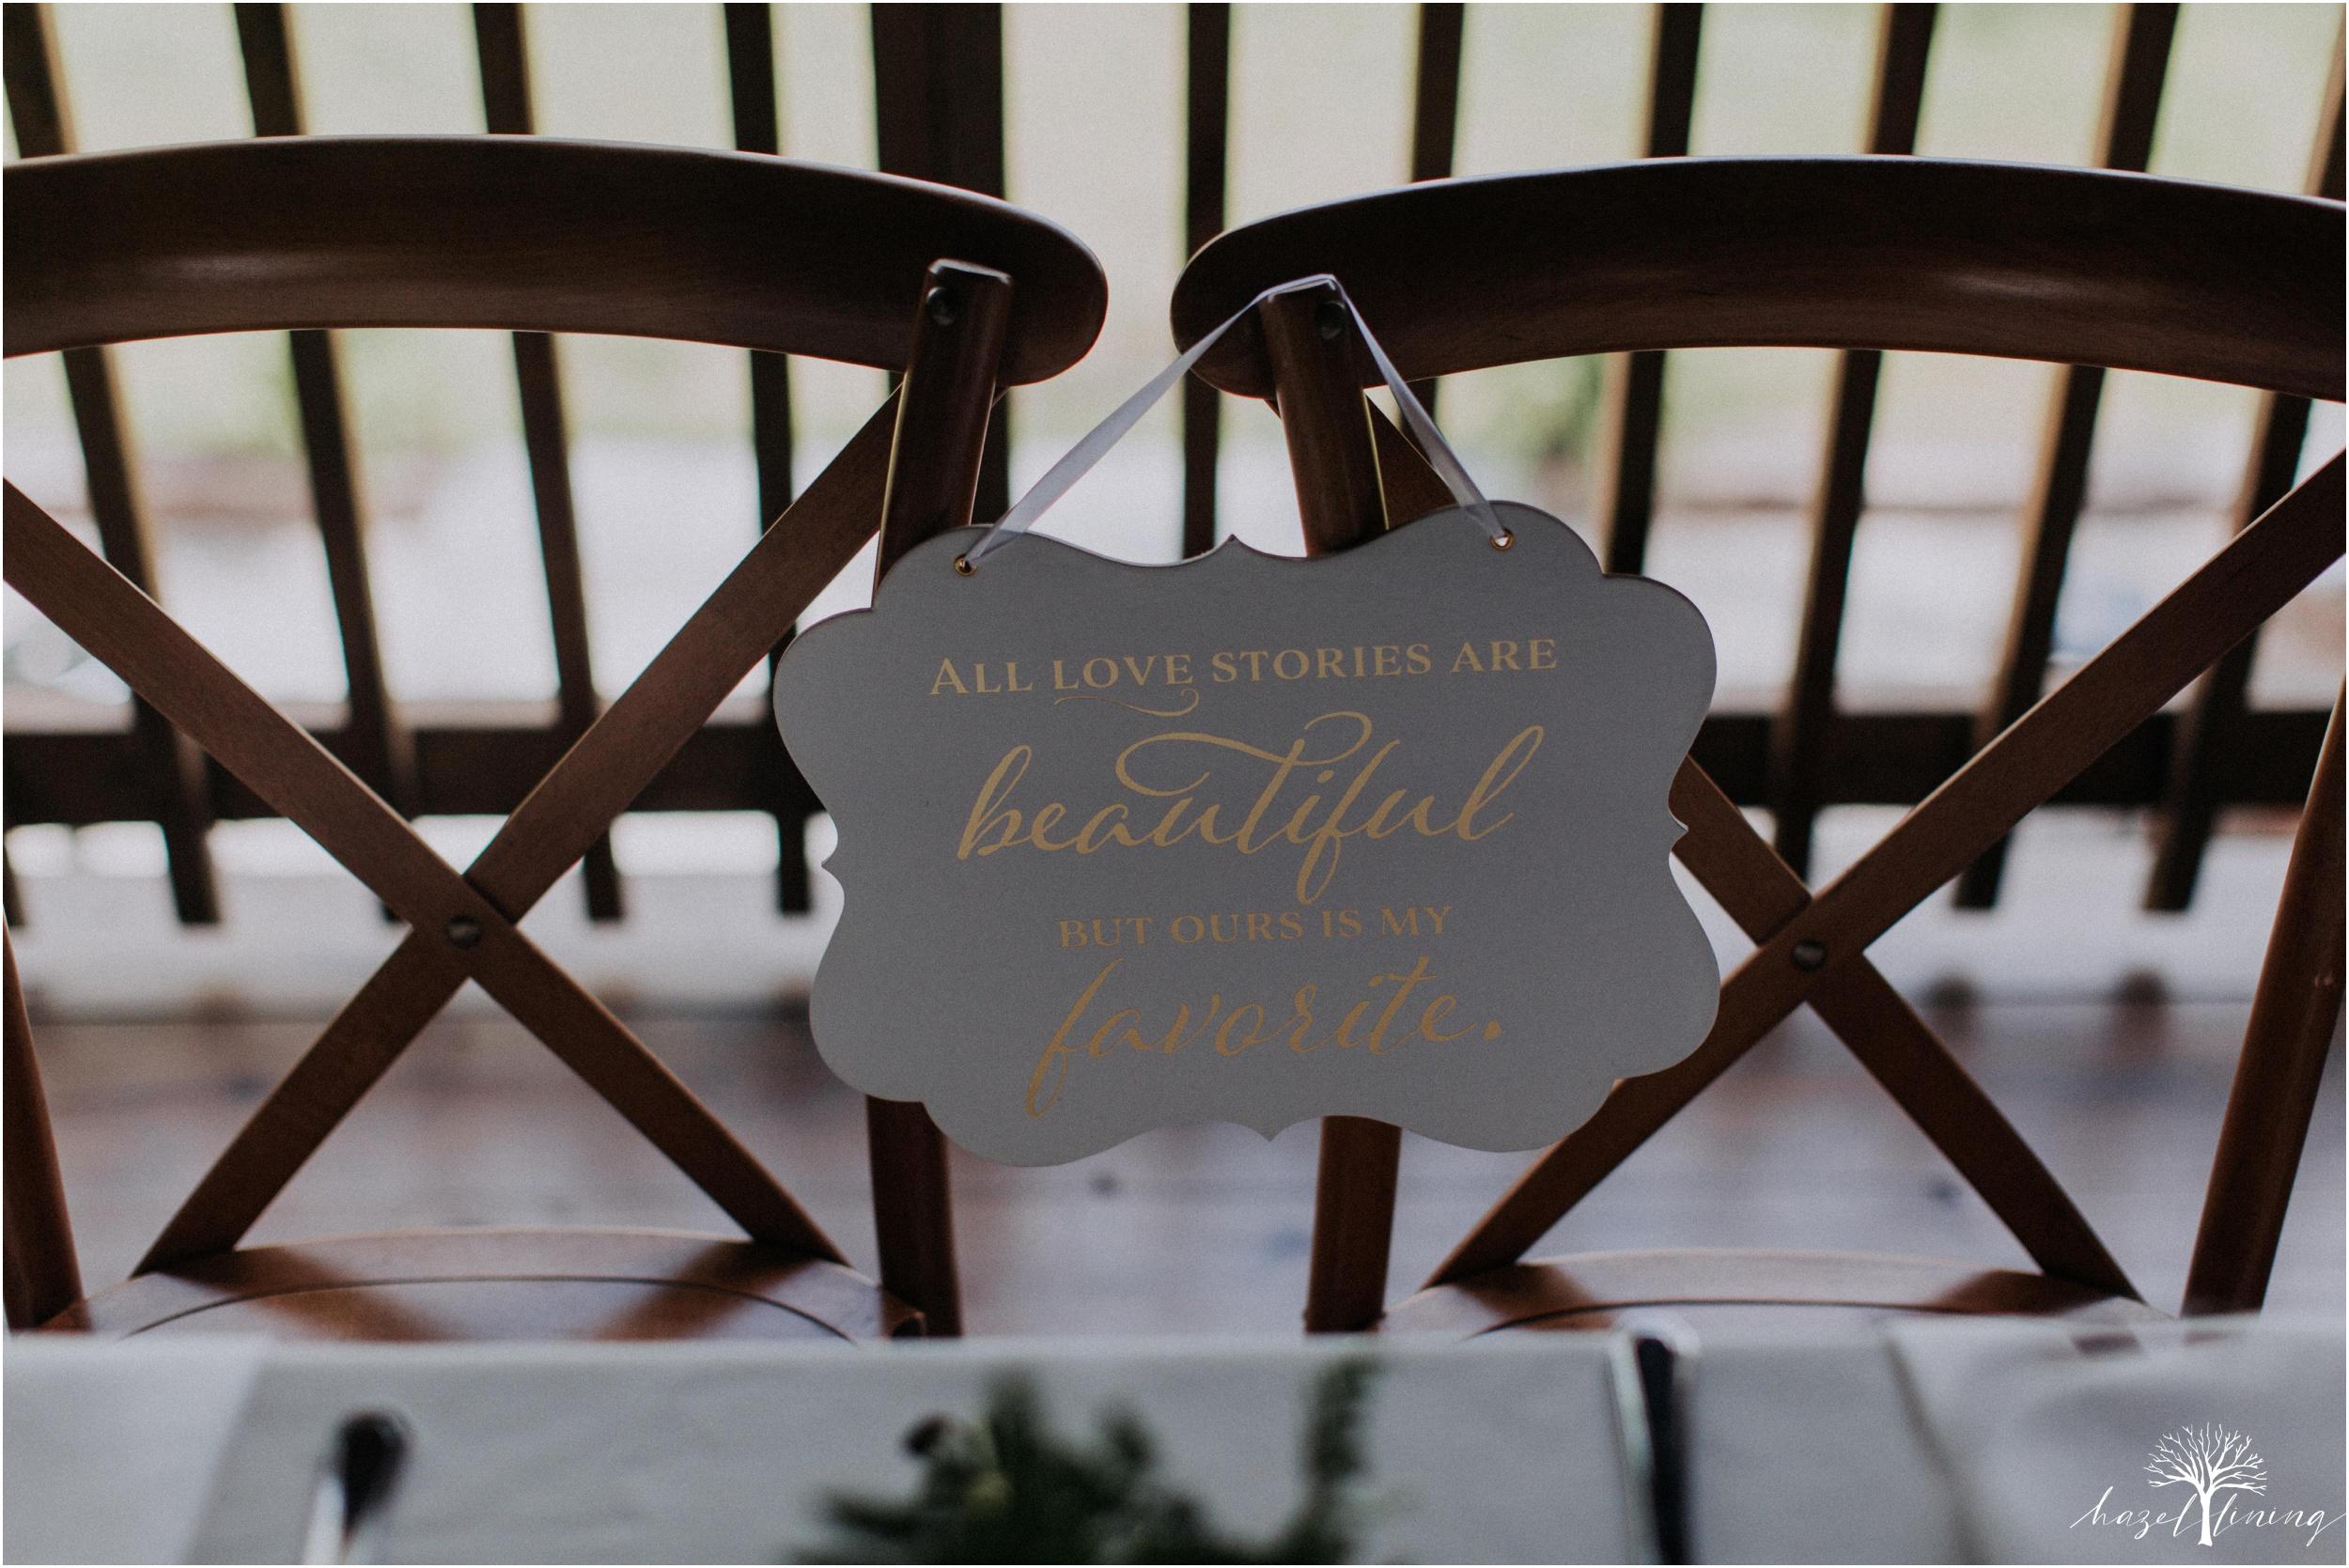 hazel-lining-travel-wedding-elopement-photography-lisa-landon-shoemaker-the-farm-bakery-and-events-bucks-county-quakertown-pennsylvania-summer-country-outdoor-farm-wedding_0108.jpg